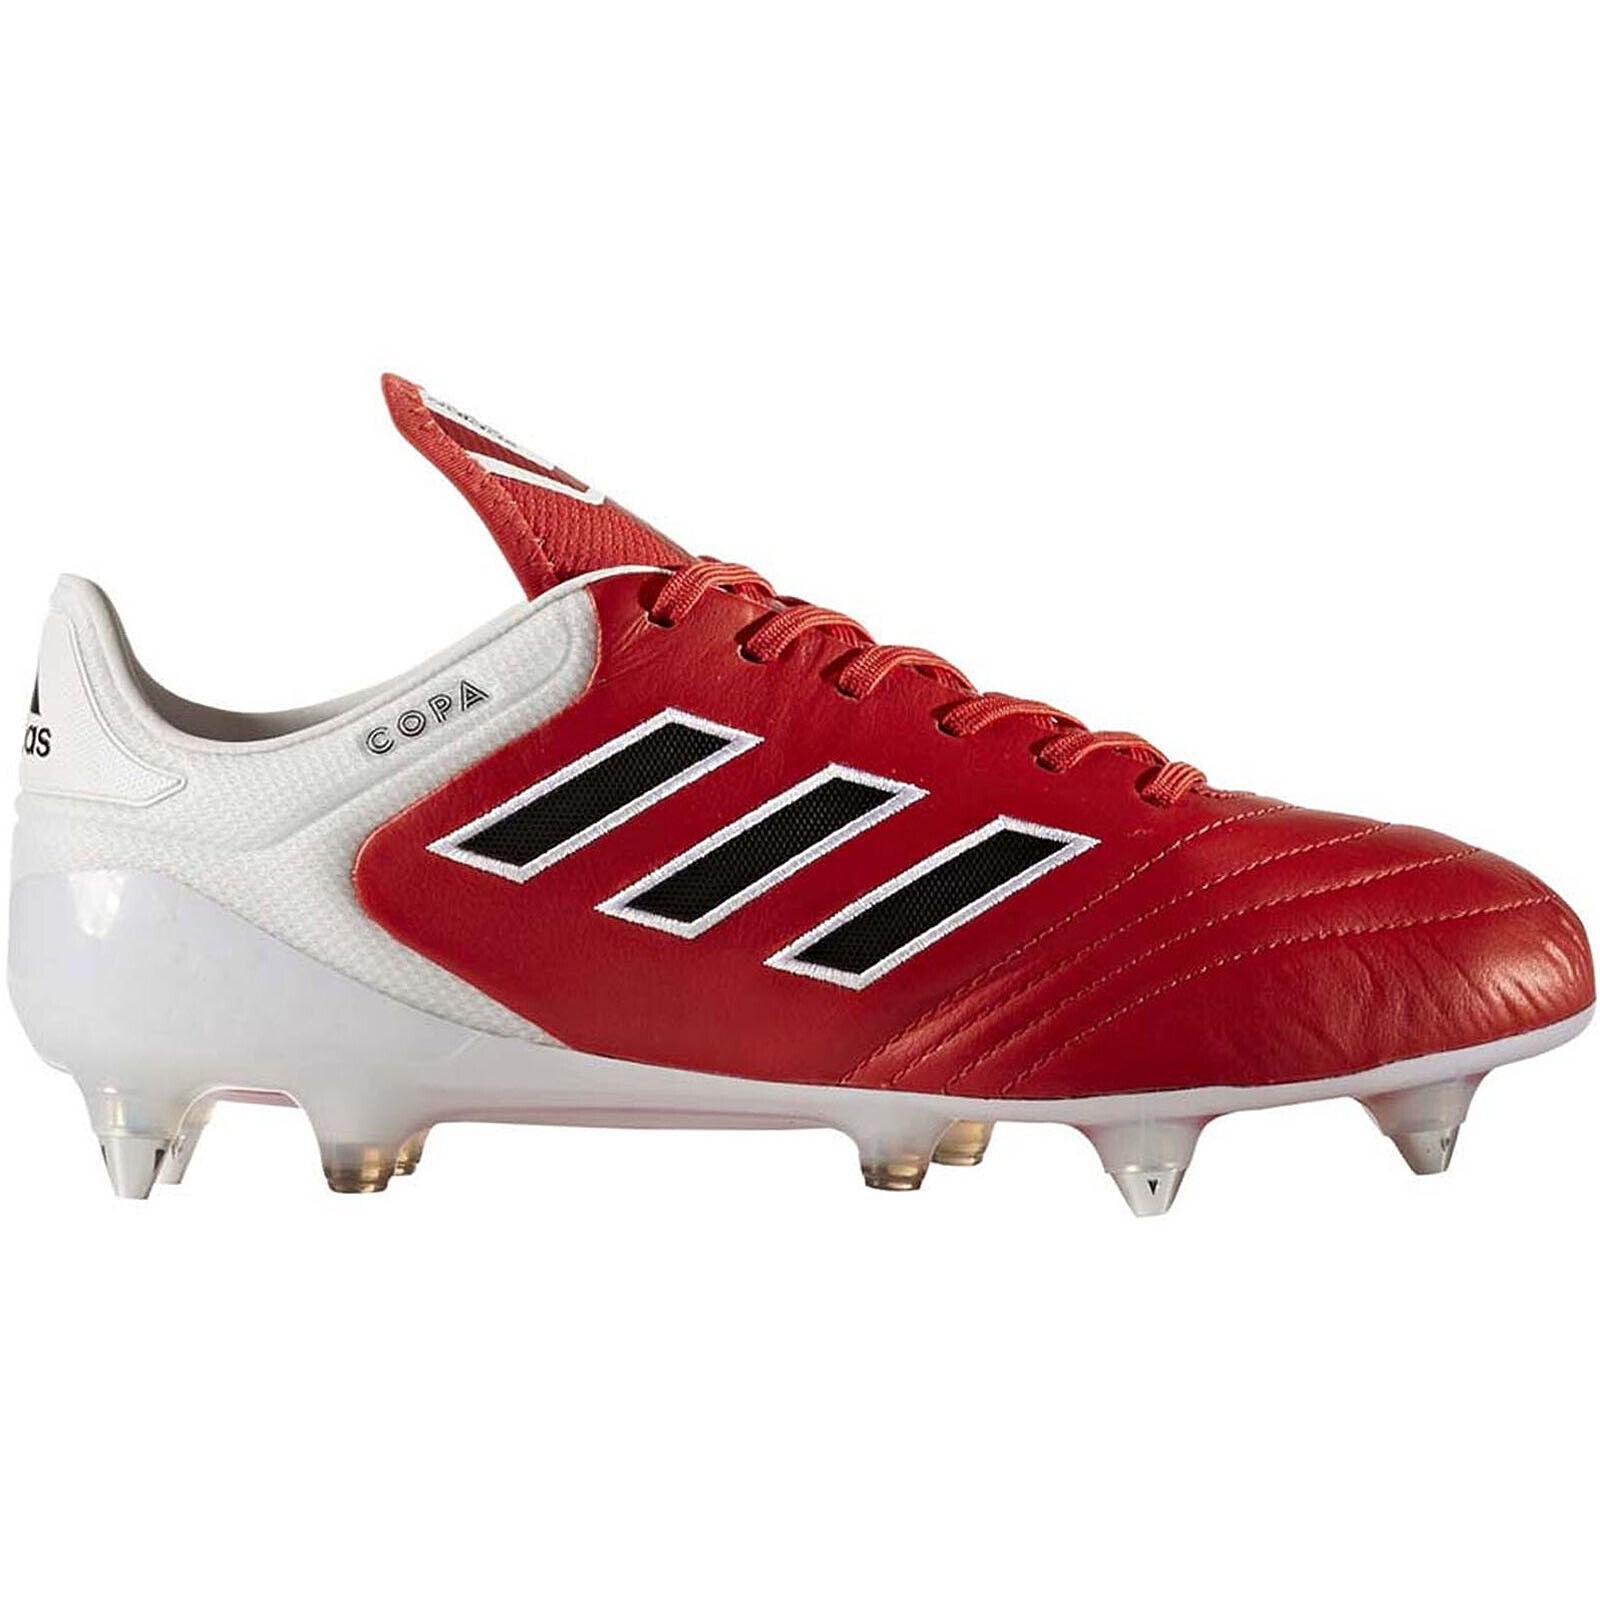 Adidas Performance Mens Copa 17.1 Soft Ground Football Soccer stivali  rosso